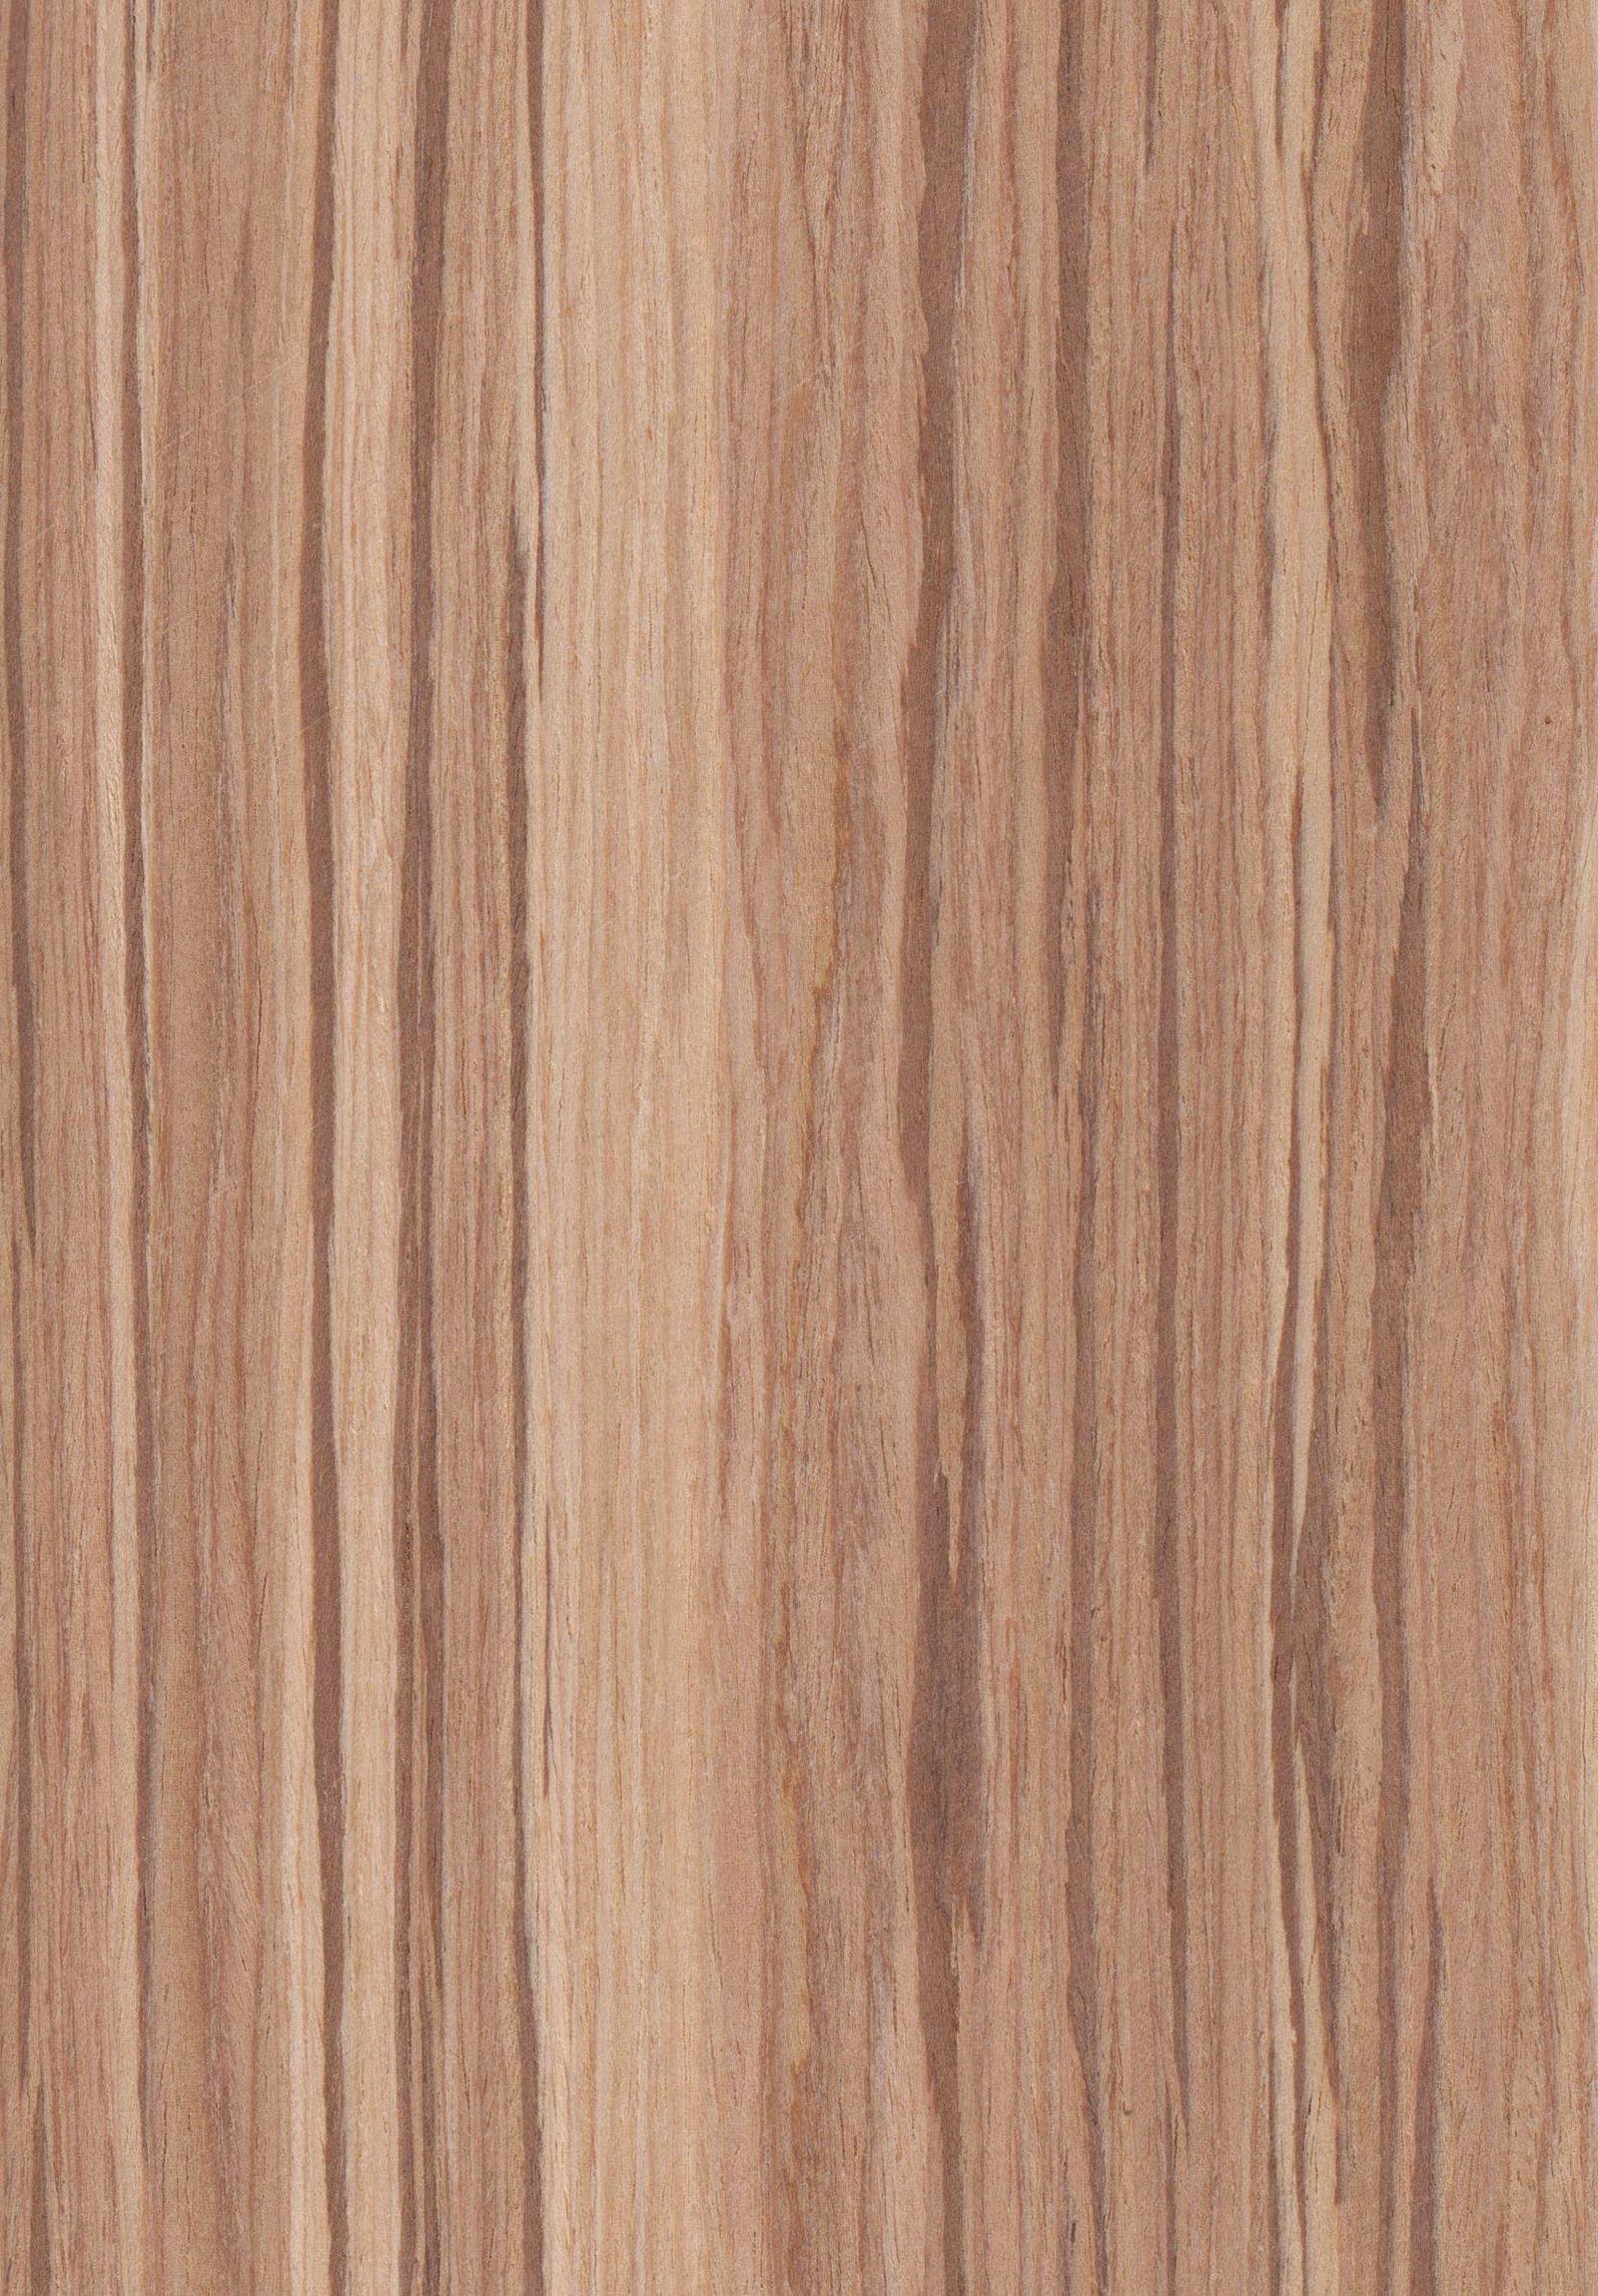 Pin Von La Casa Deco Auf Wood Veneers